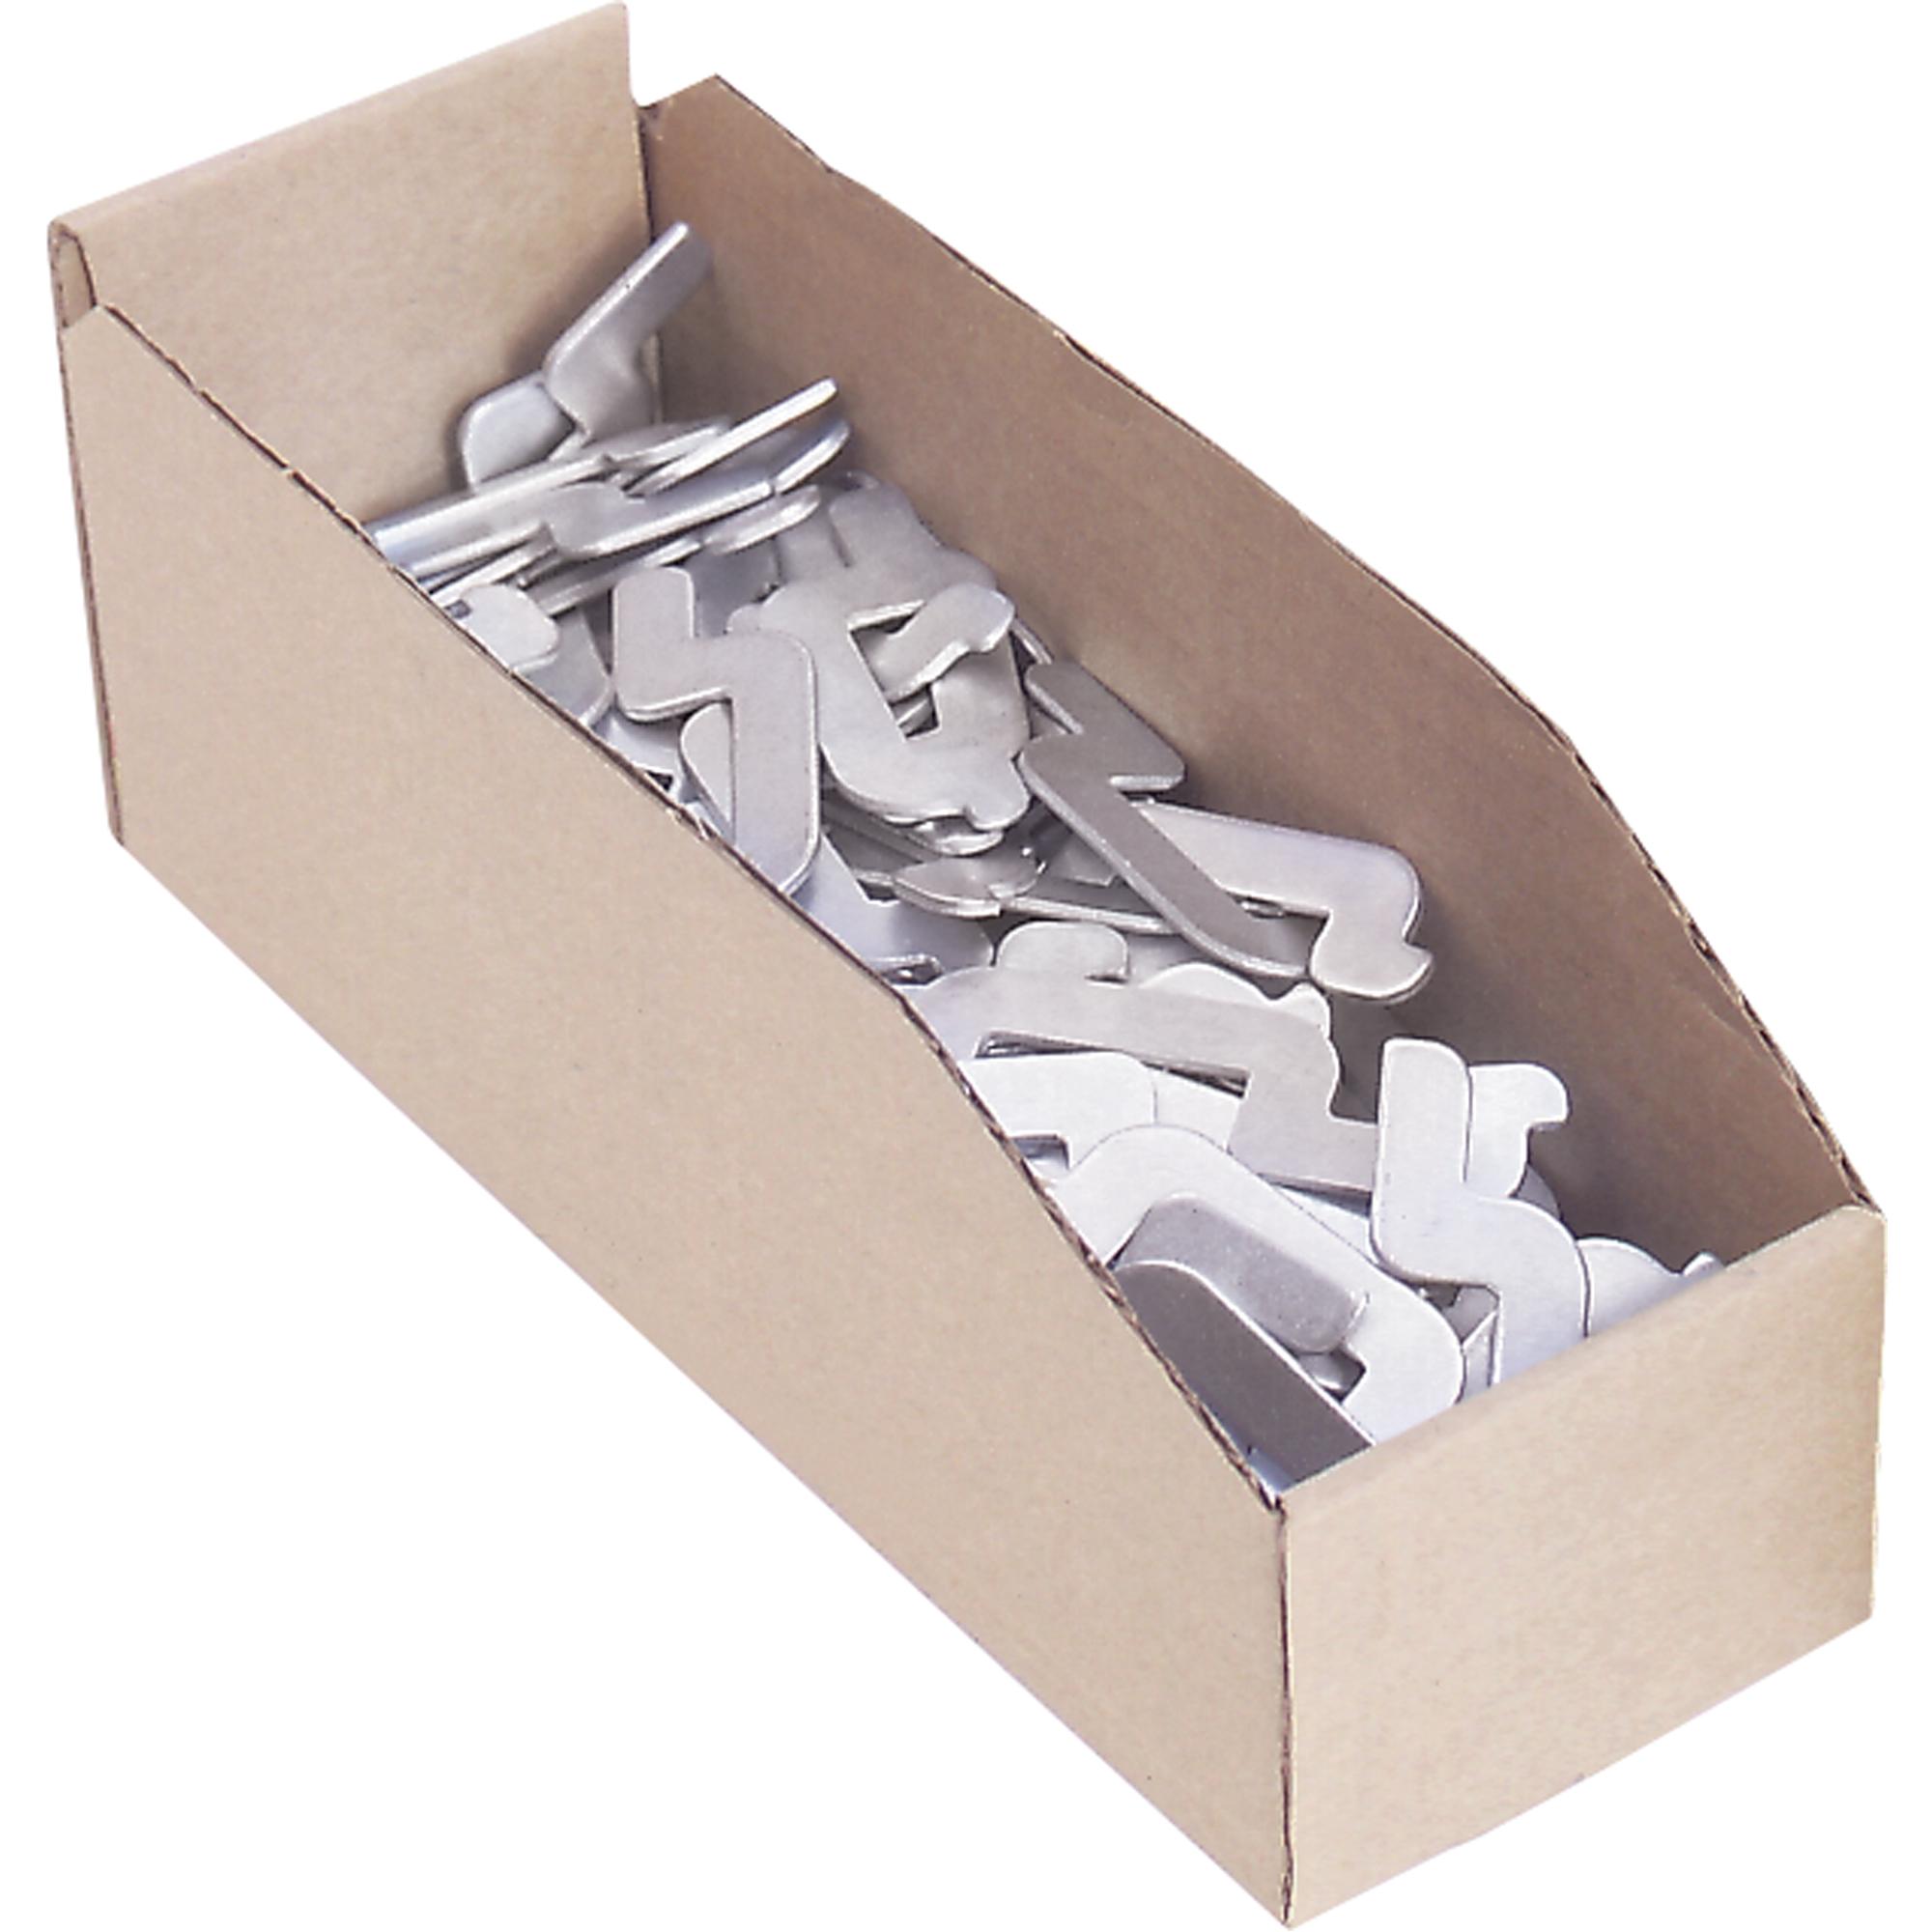 "Cardinal Boxes 12"" Deep Corrugated Parts Bins, 6"" W x 12"" D x 4-1/2"" H, Beige"